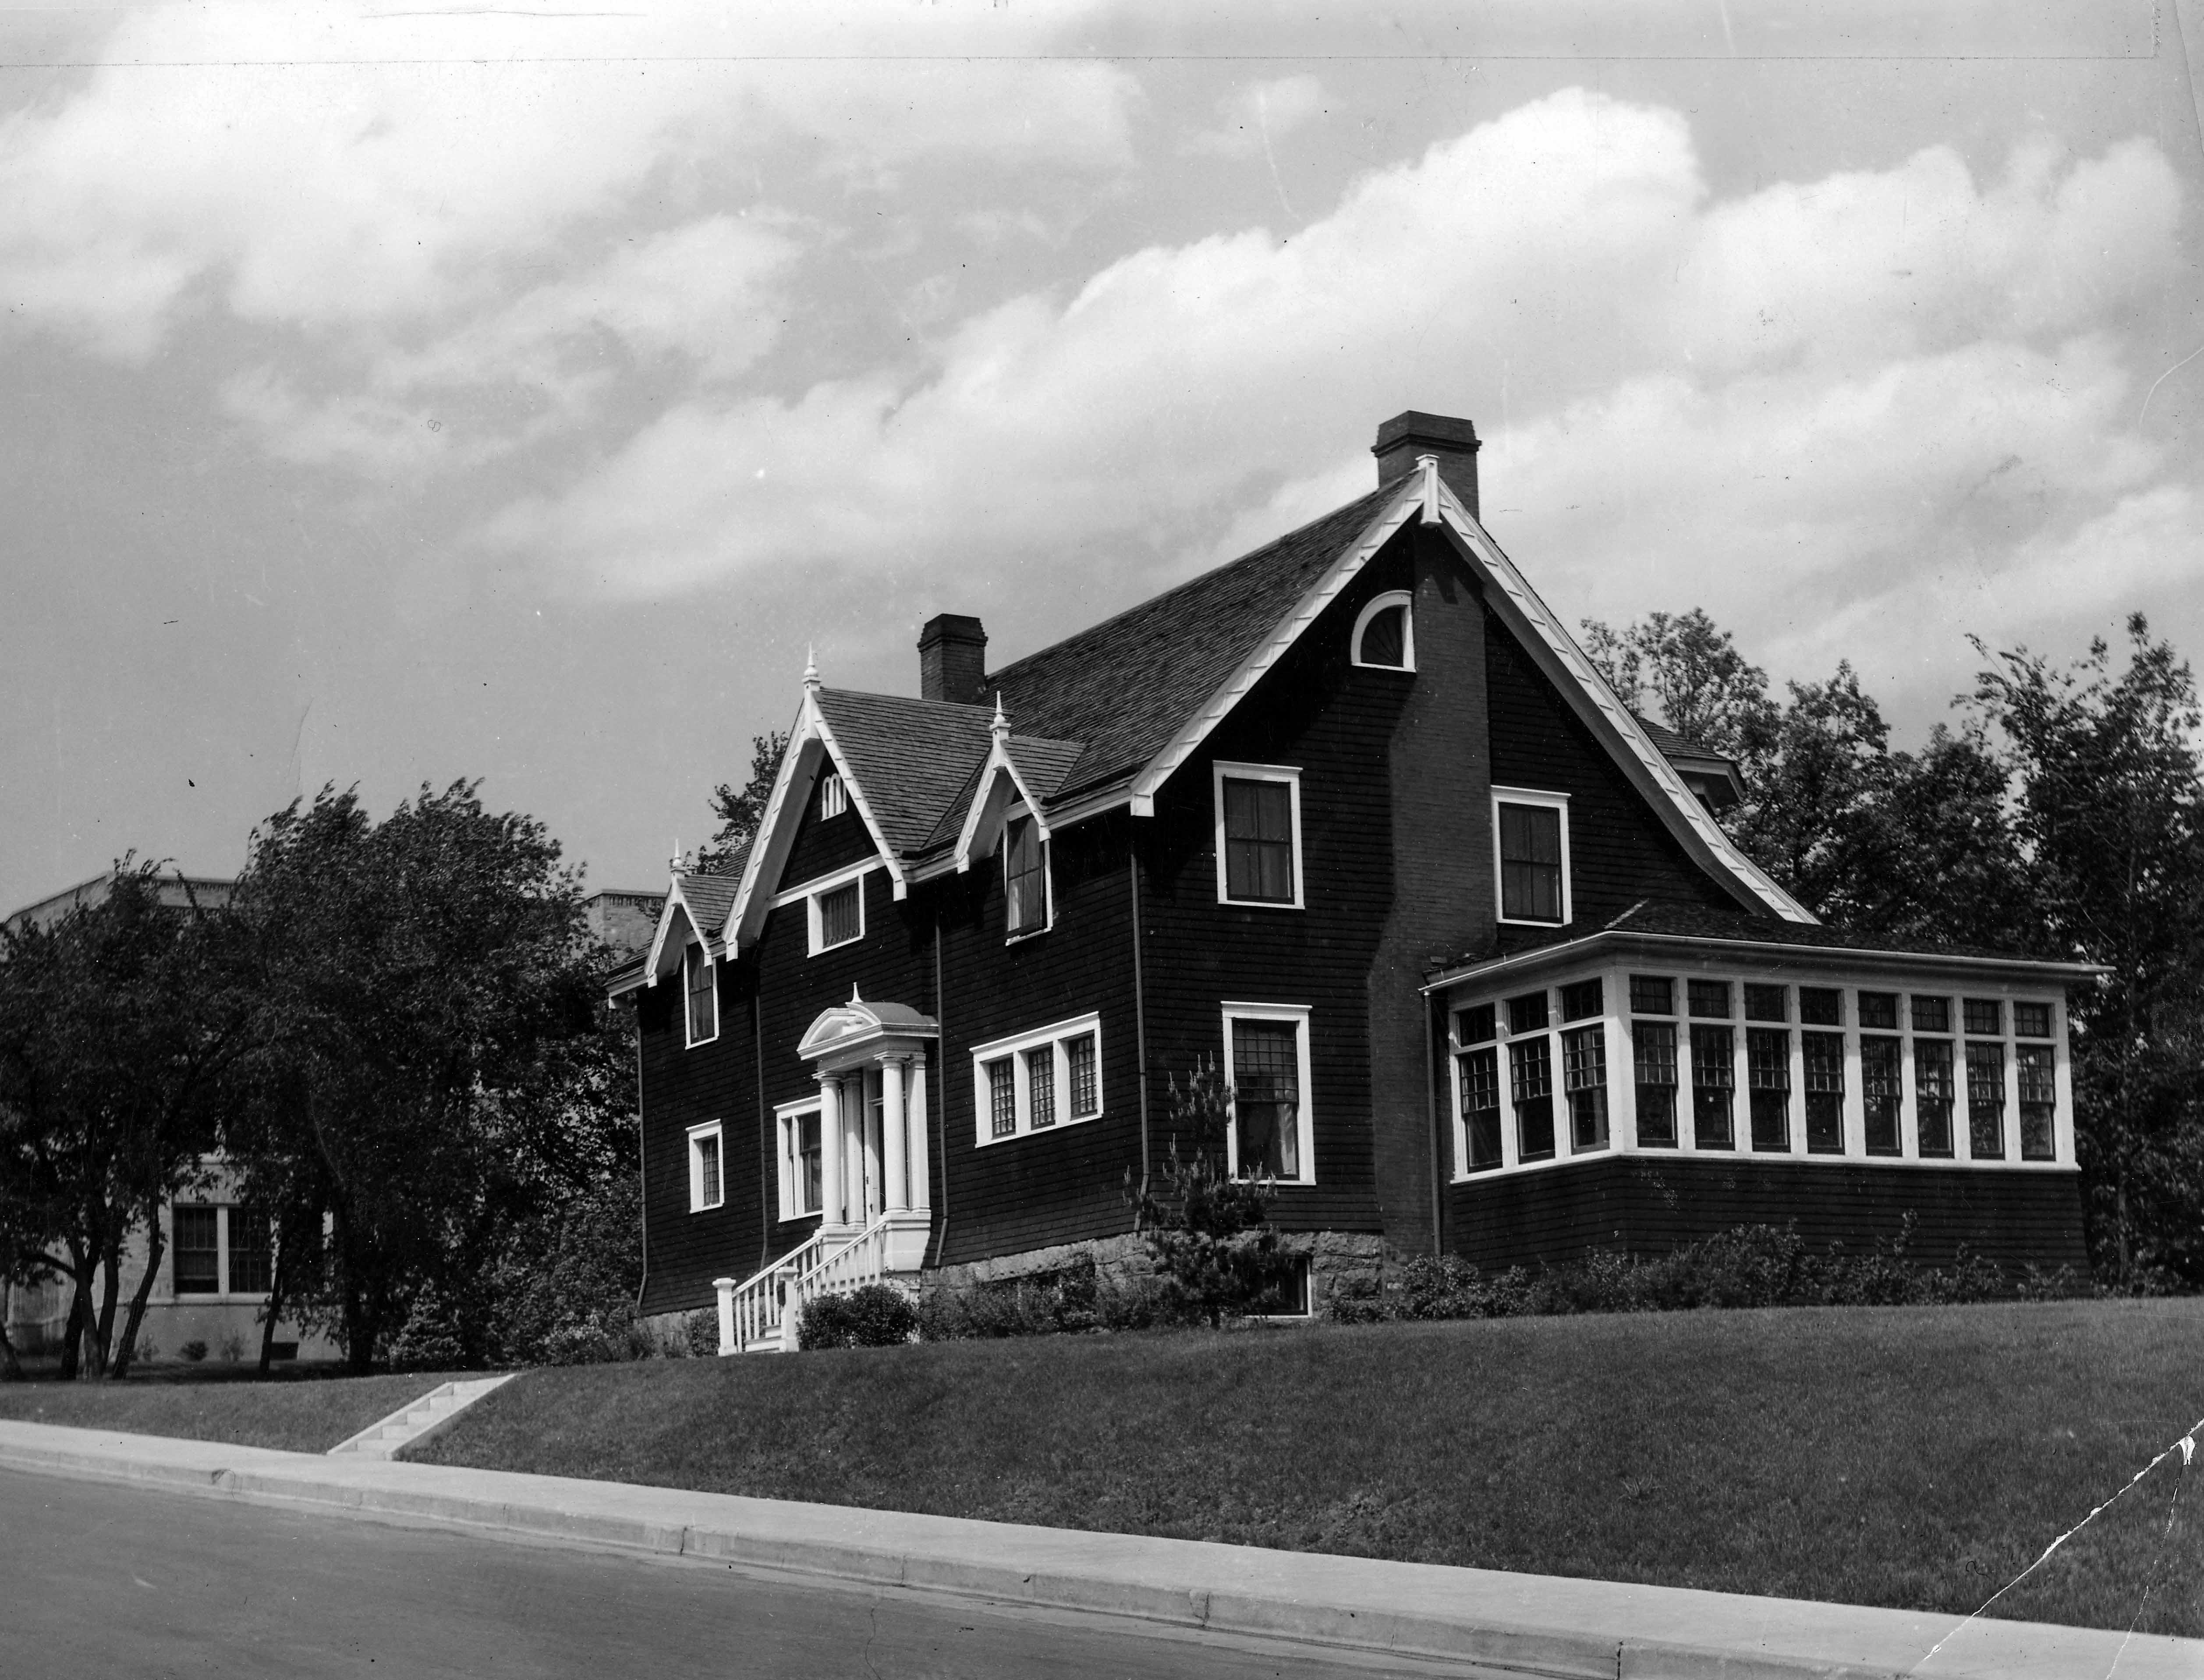 Music Studio with porch, 1967?